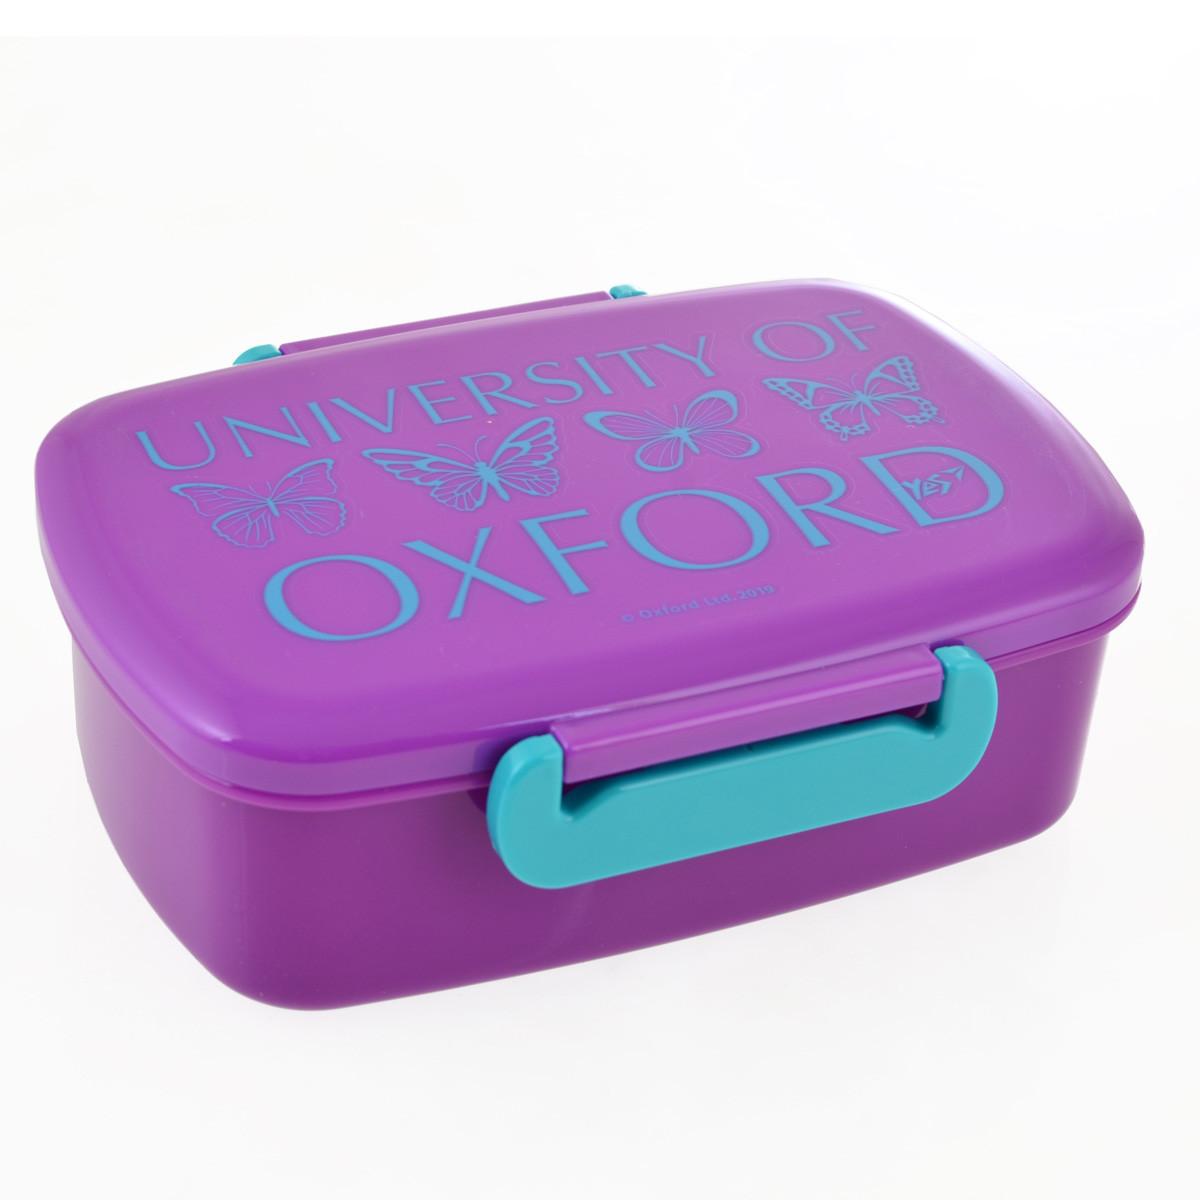 Контейнер для еды Oxford Butterflies 750 мл код: 706856